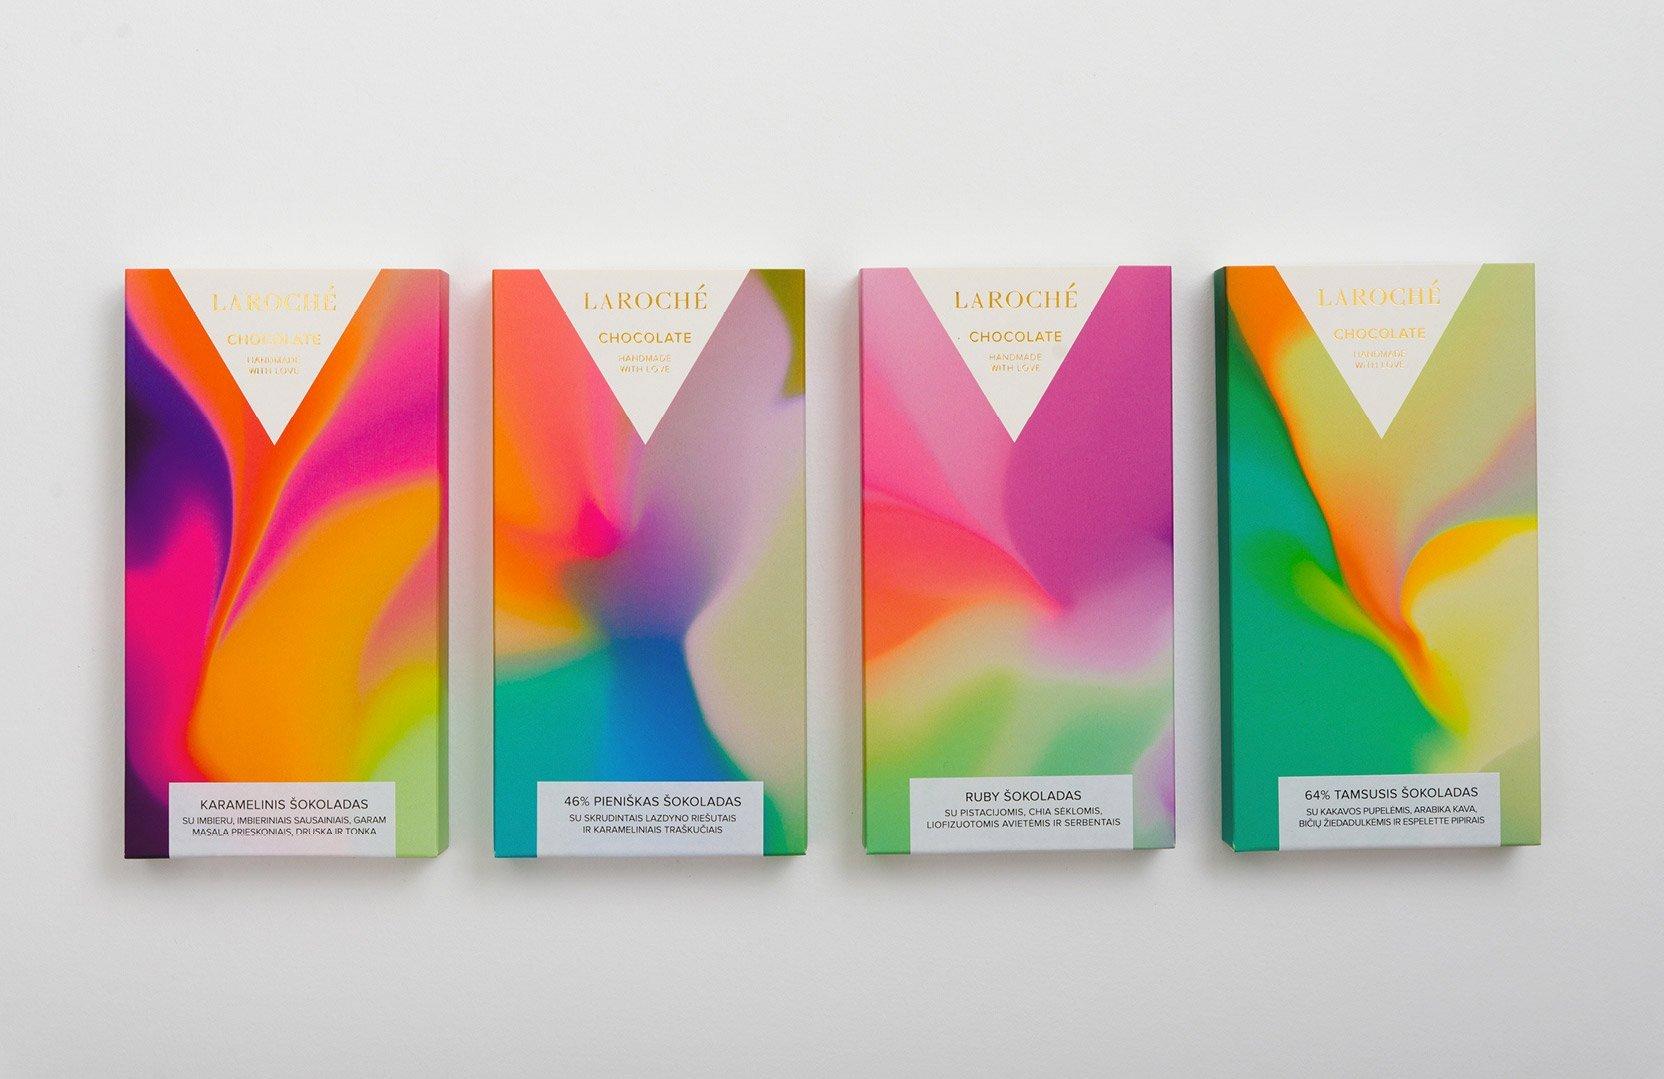 Laroche-Chocolate-Packaging-by-Martin-Naumann-08